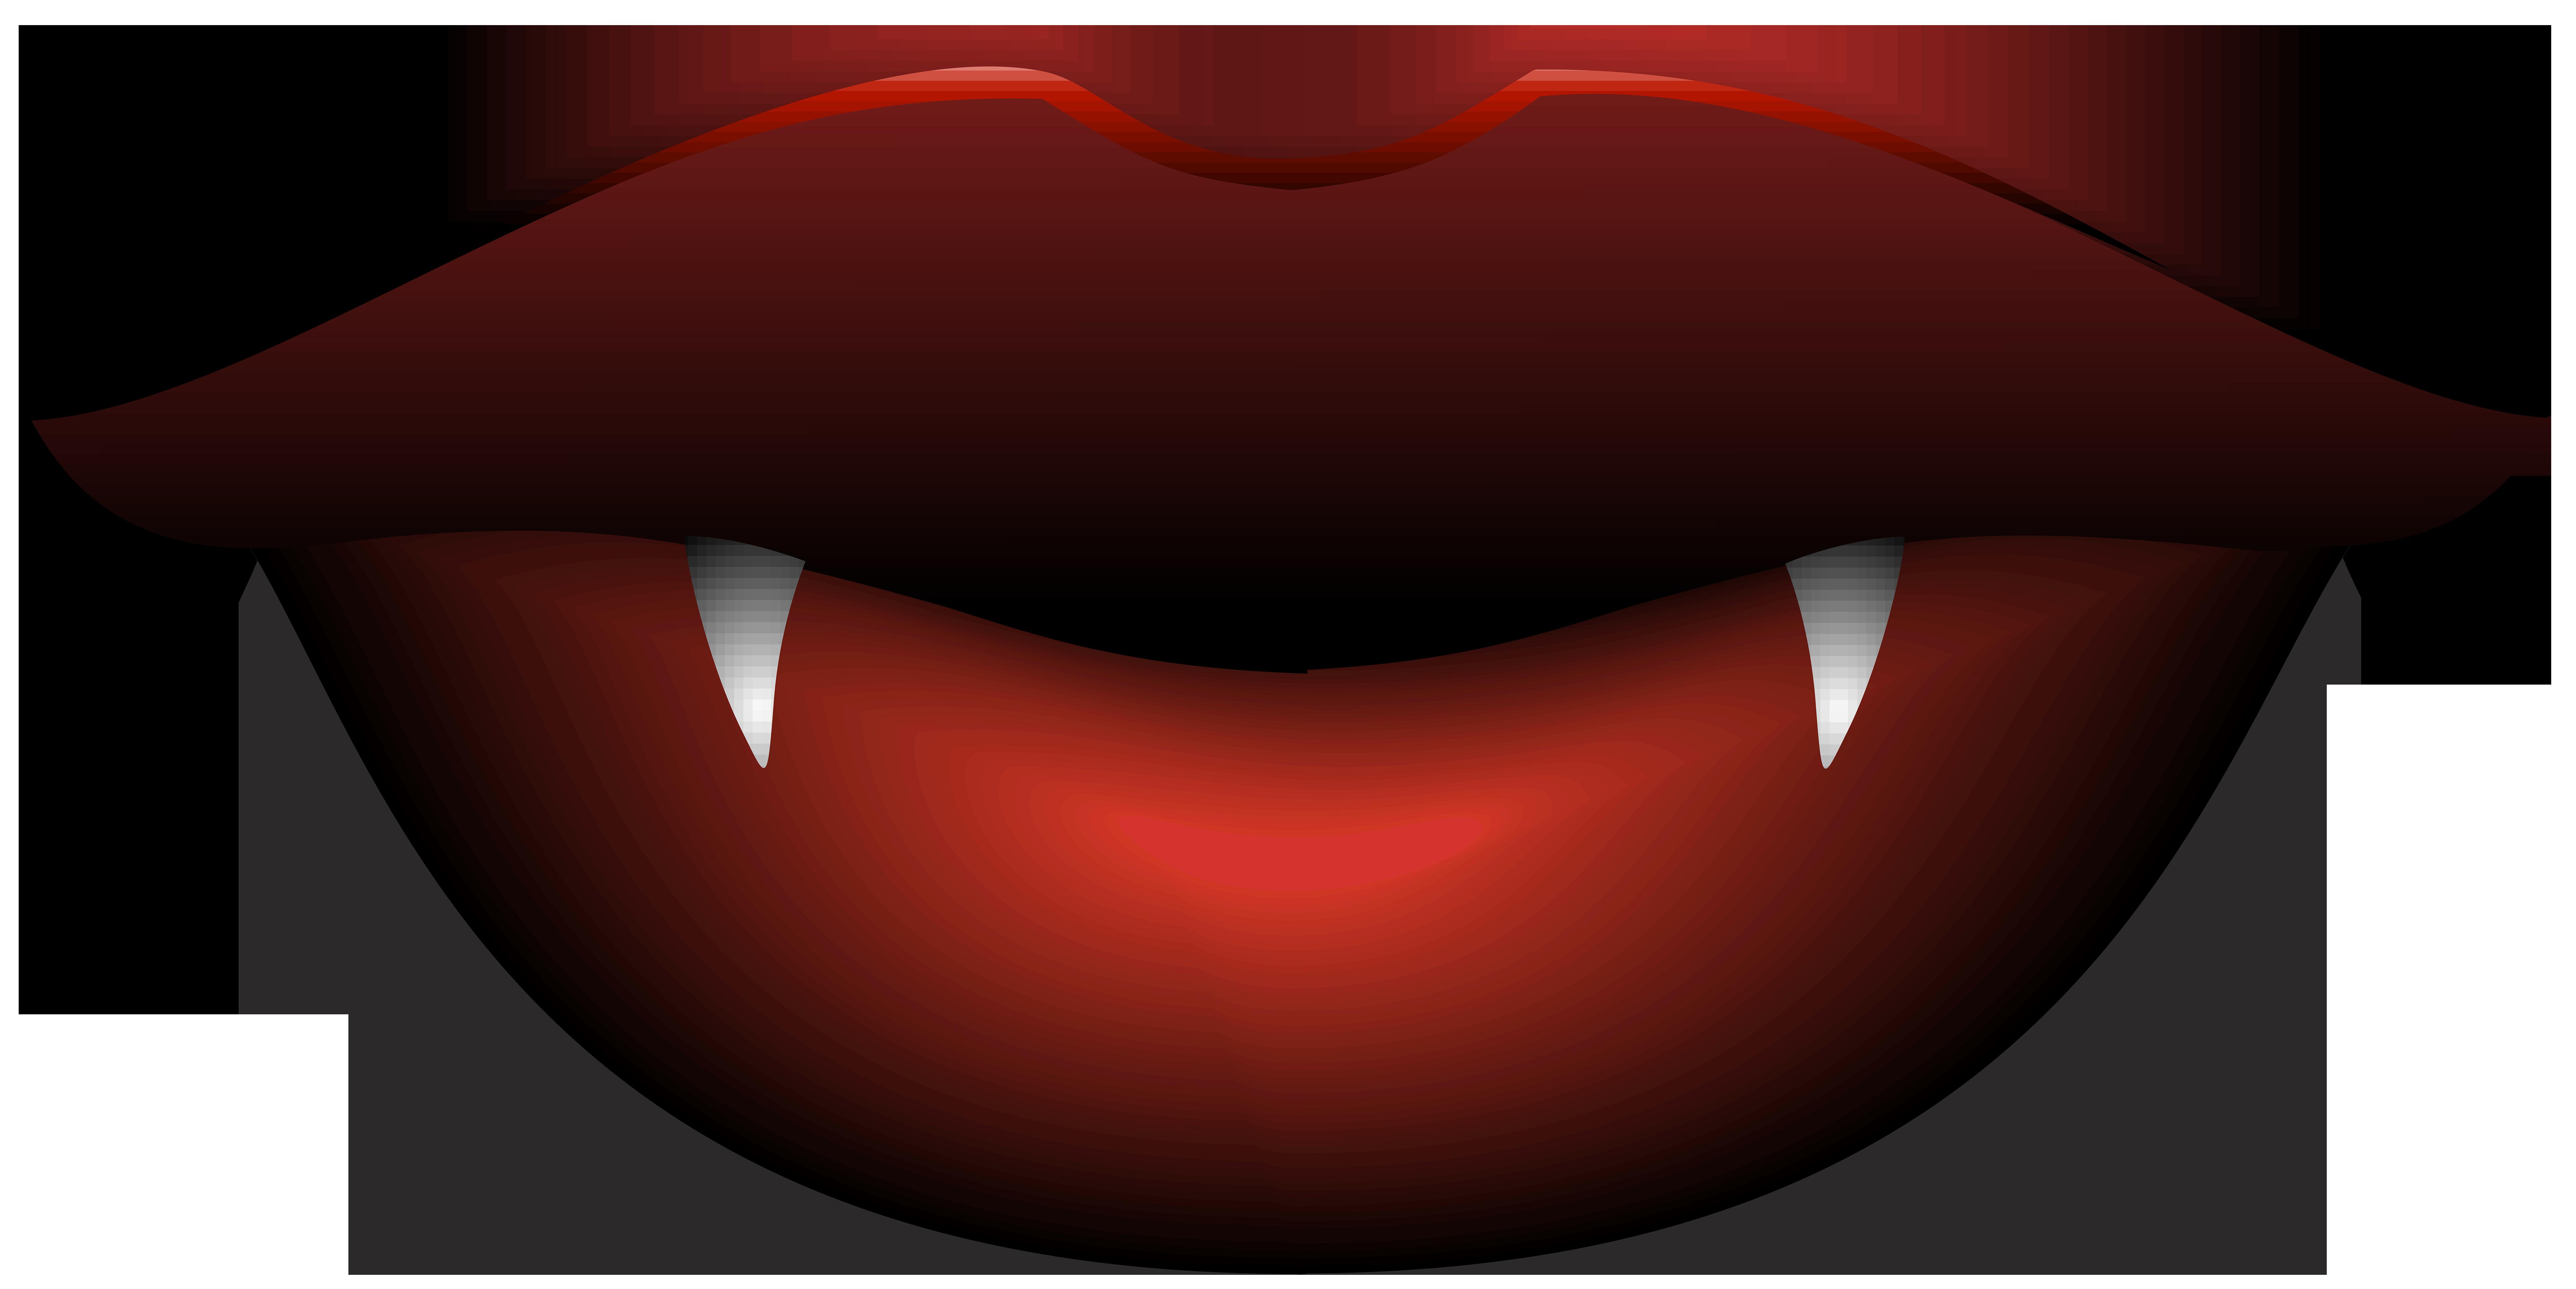 Vampire lips transparent.